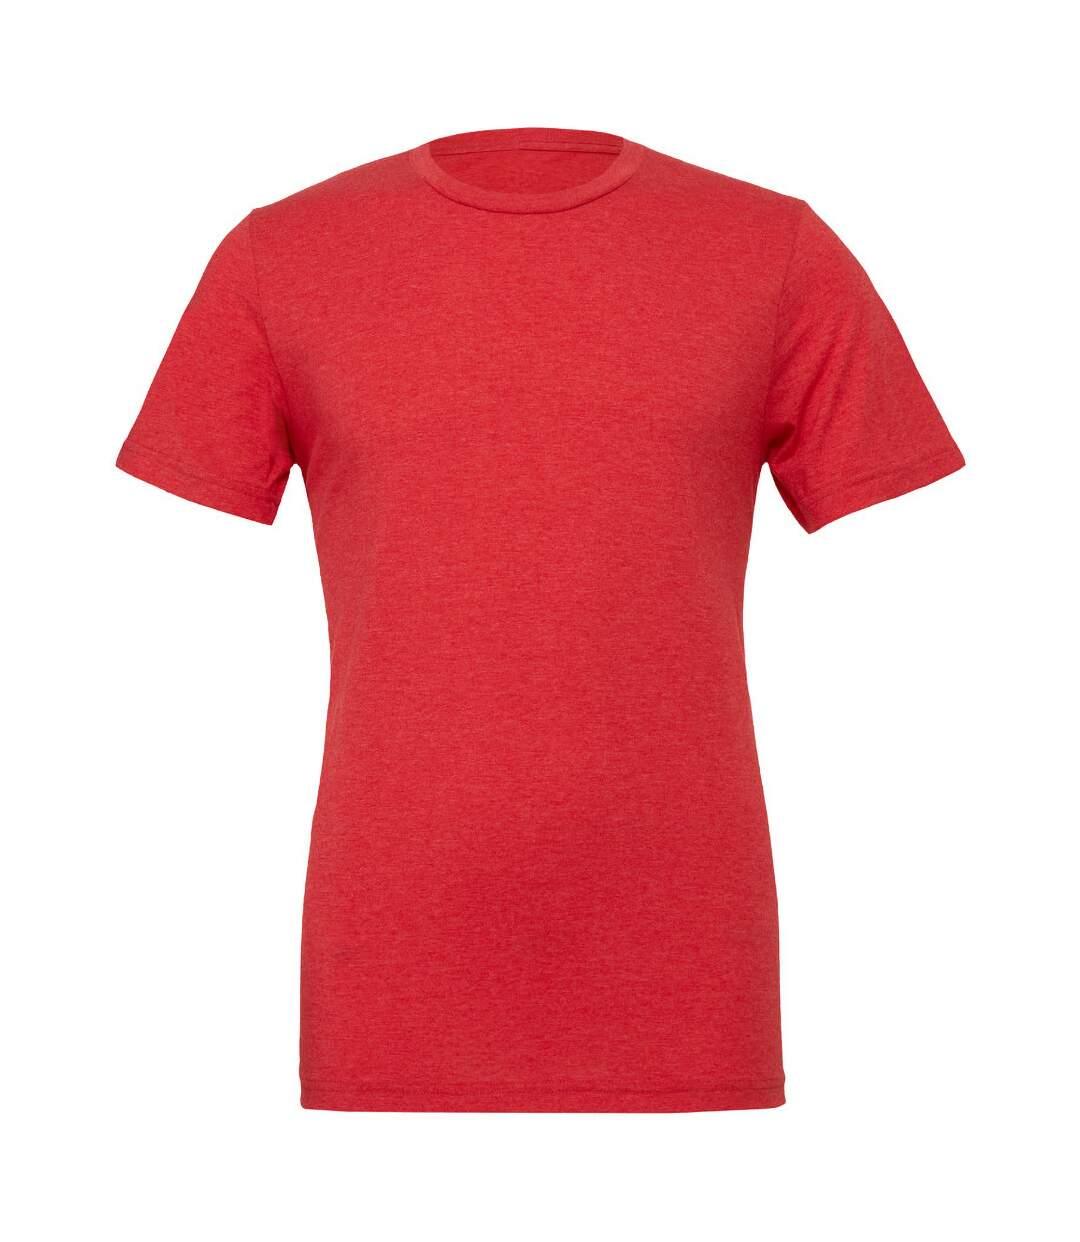 Canvas Mens Triblend Crew Neck Plain Short Sleeve T-Shirt (Red Triblend) - UTBC2596